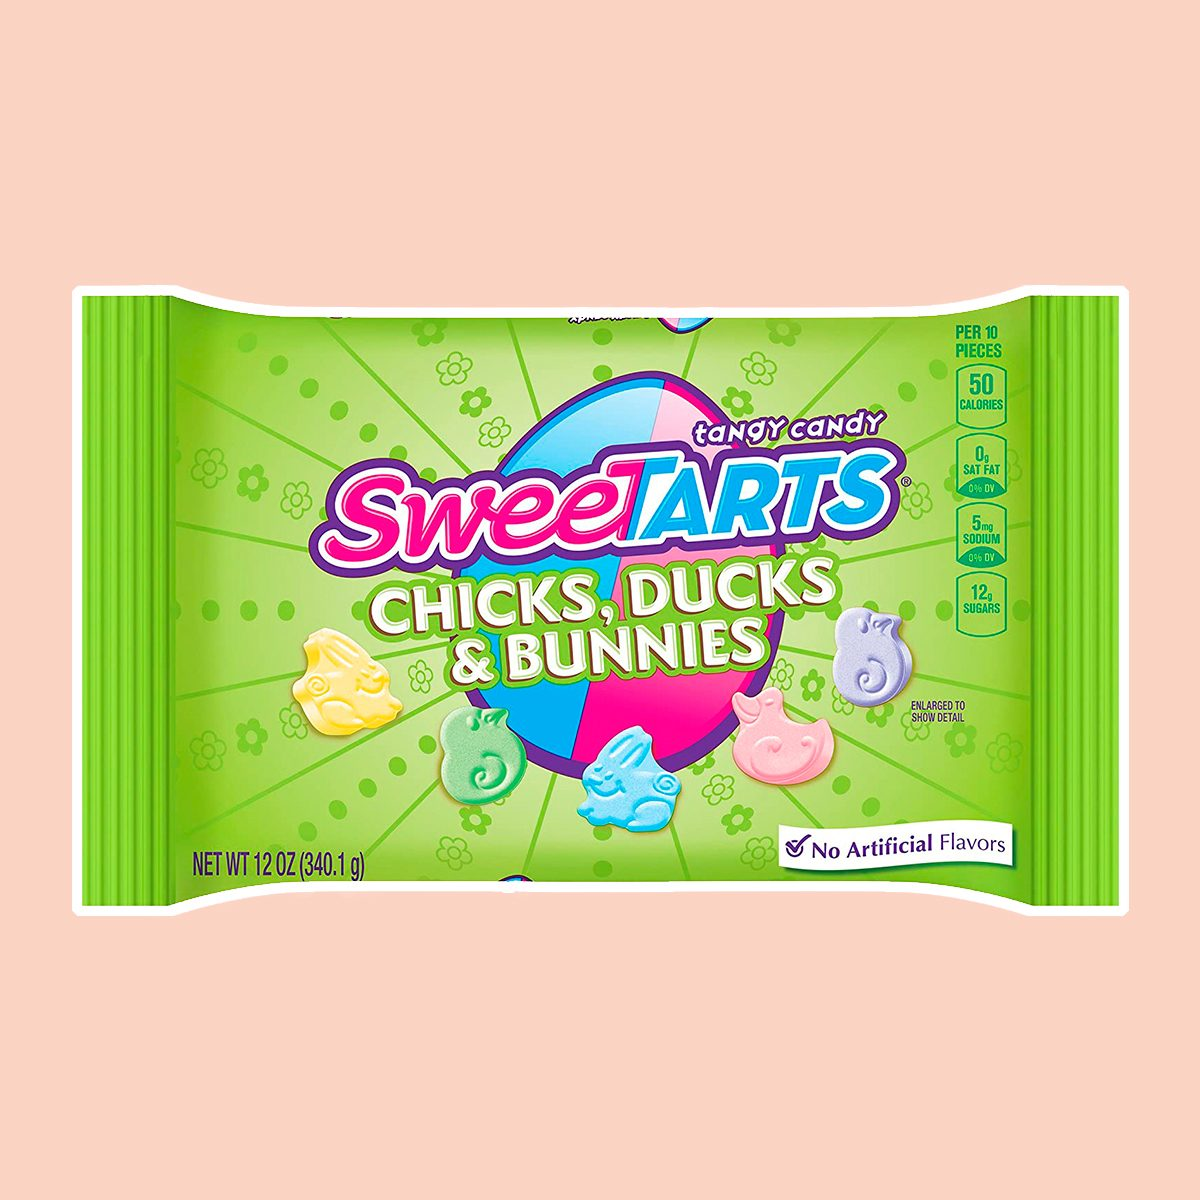 SweeTARTS Chicks, Ducks and Bunnies